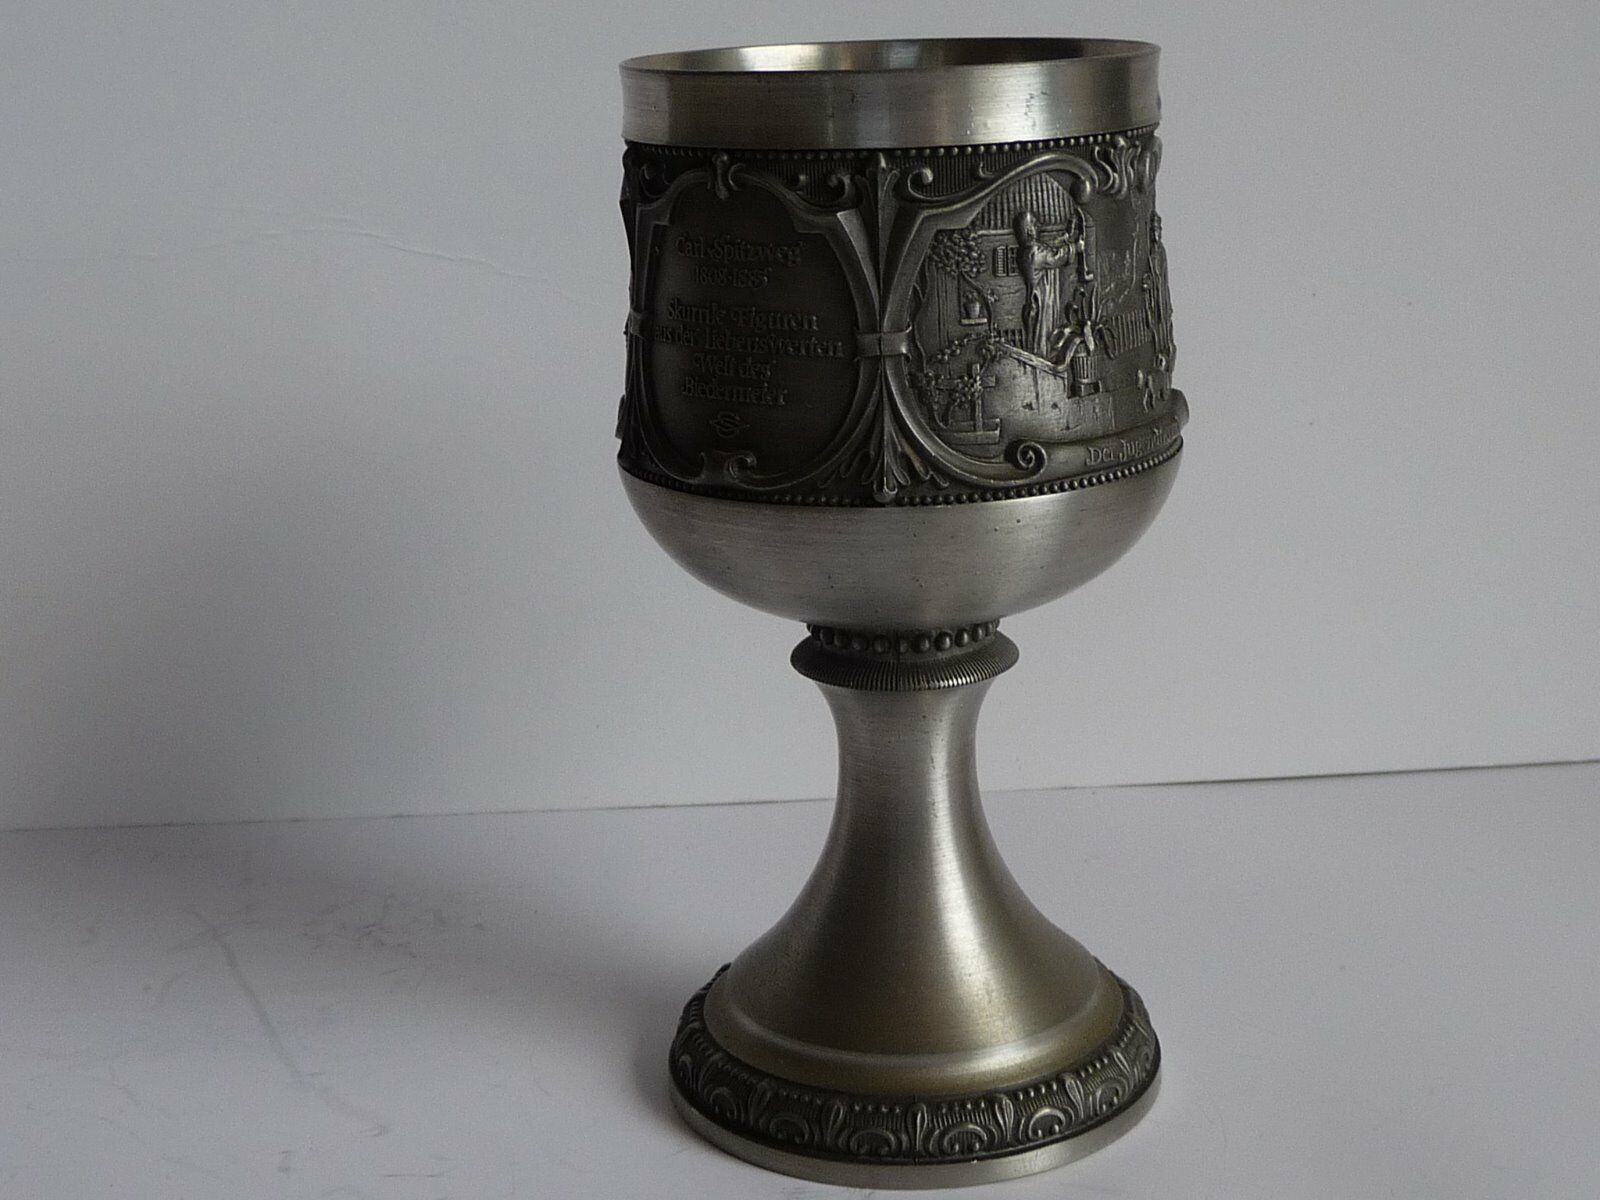 Zinn-Pokale (4), (4), (4), WMF,  Serie Spitzweg, Motive  Der arme Poet  u. Jugendfreund    Creative  47ec72